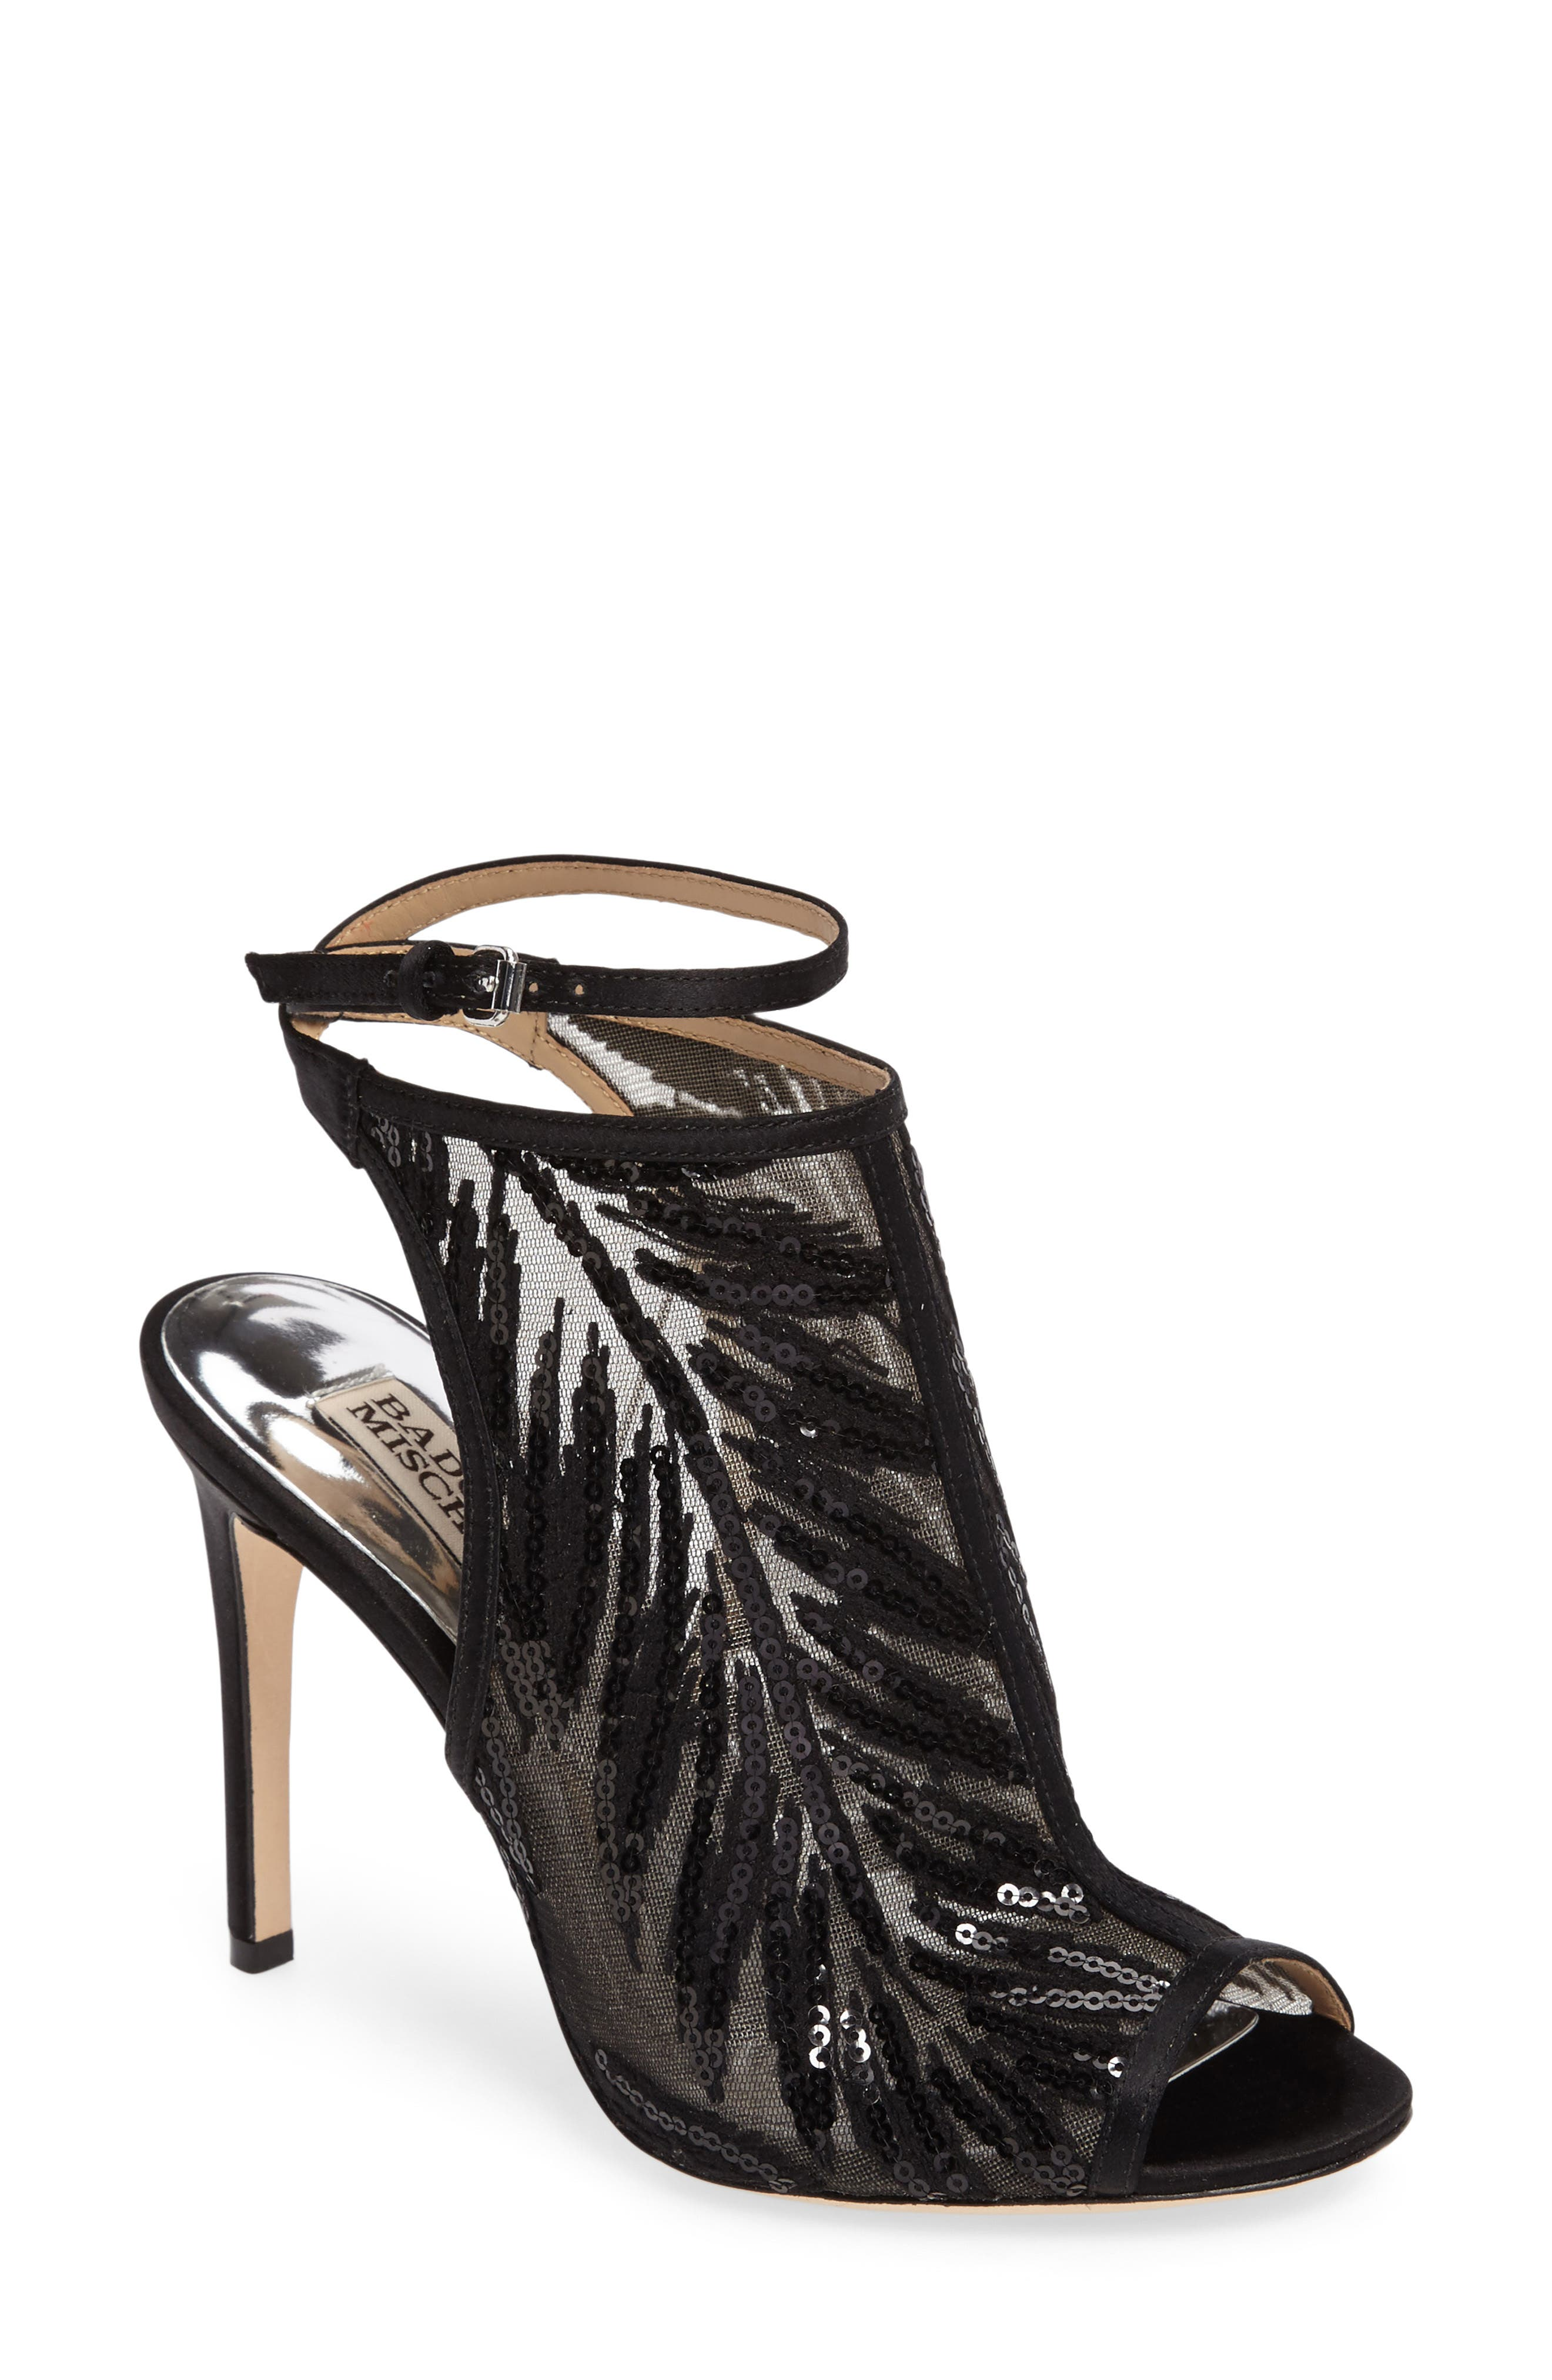 Alternate Image 1 Selected - Badgley Mischka Blakely Sequin Illusion Sandal (Women)